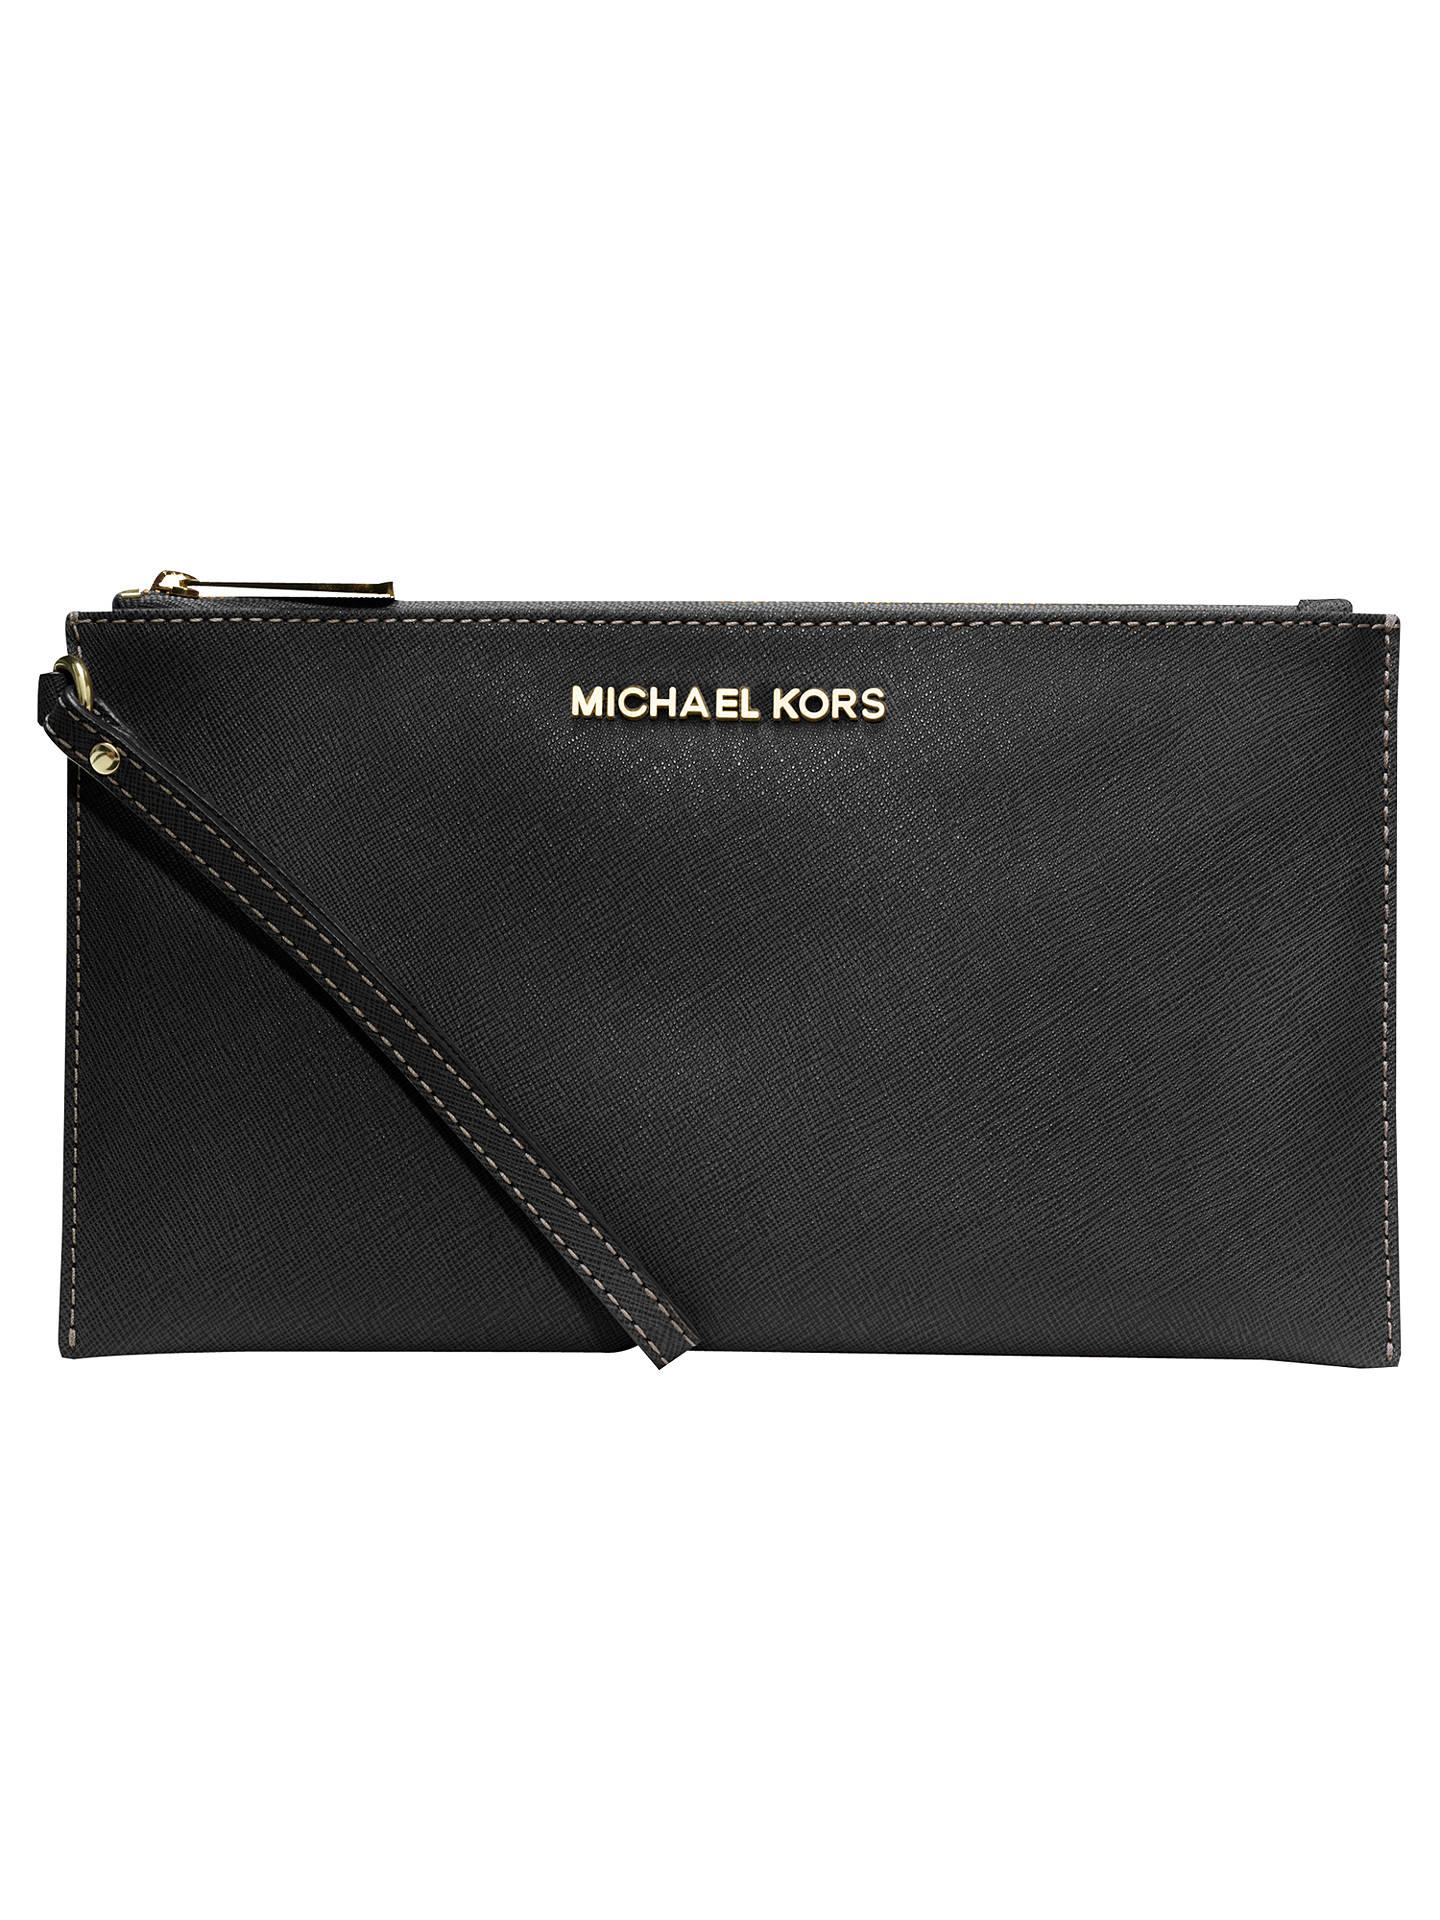 dcc1fef0a7d1 Buy MICHAEL Michael Kors Jet Set Travel Zip Top Leather Continental Purse,  Black Online at ...